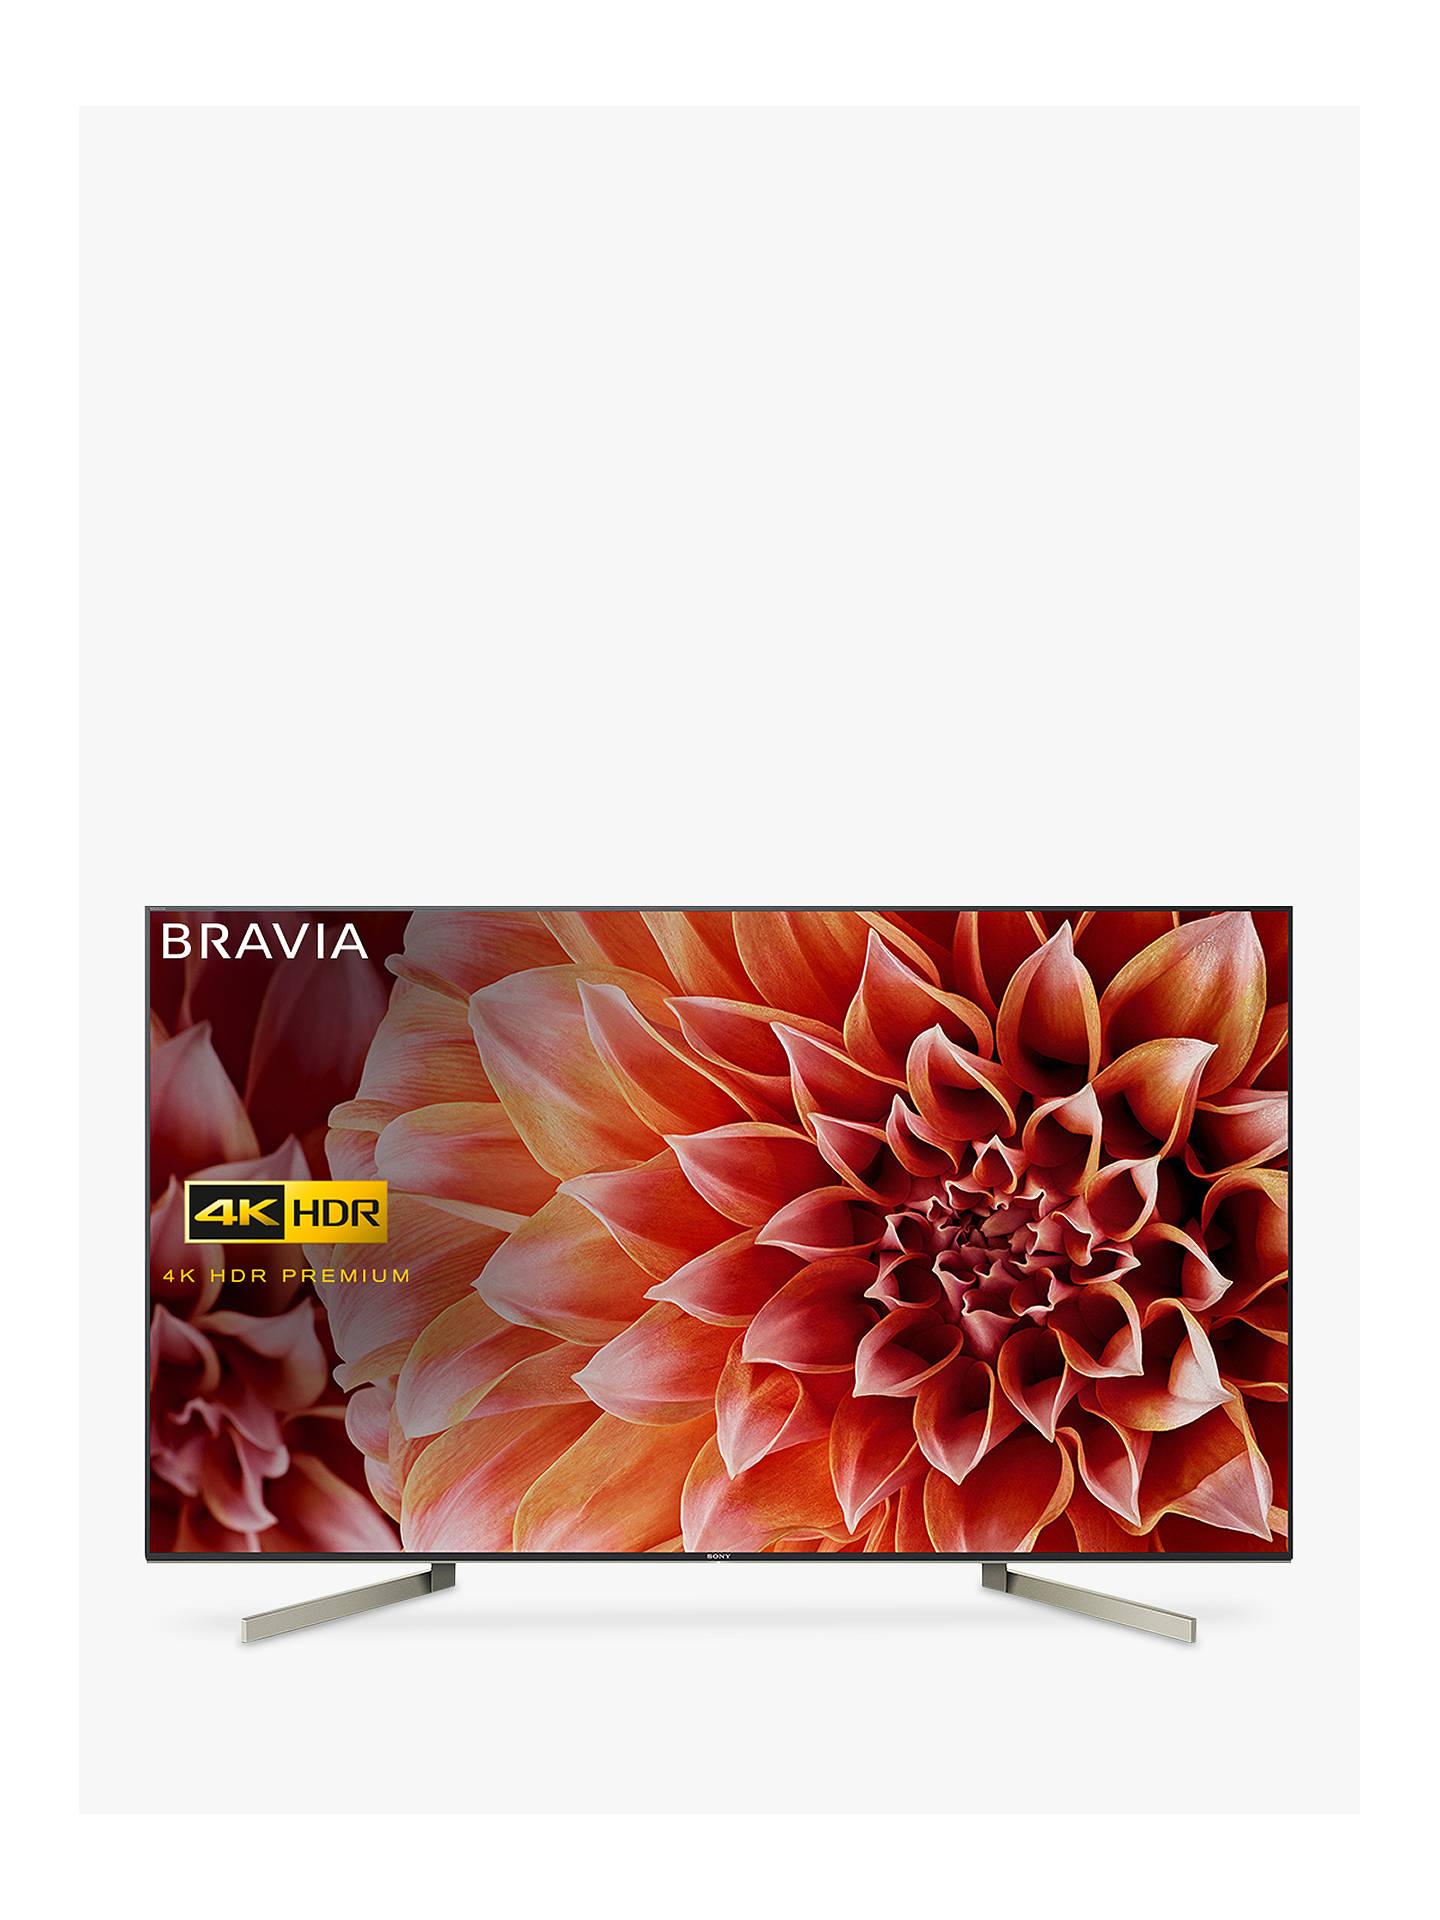 752c66e7fce Buy Sony Bravia KD75XF9005 LED HDR 4K Ultra HD Smart Android TV, 75